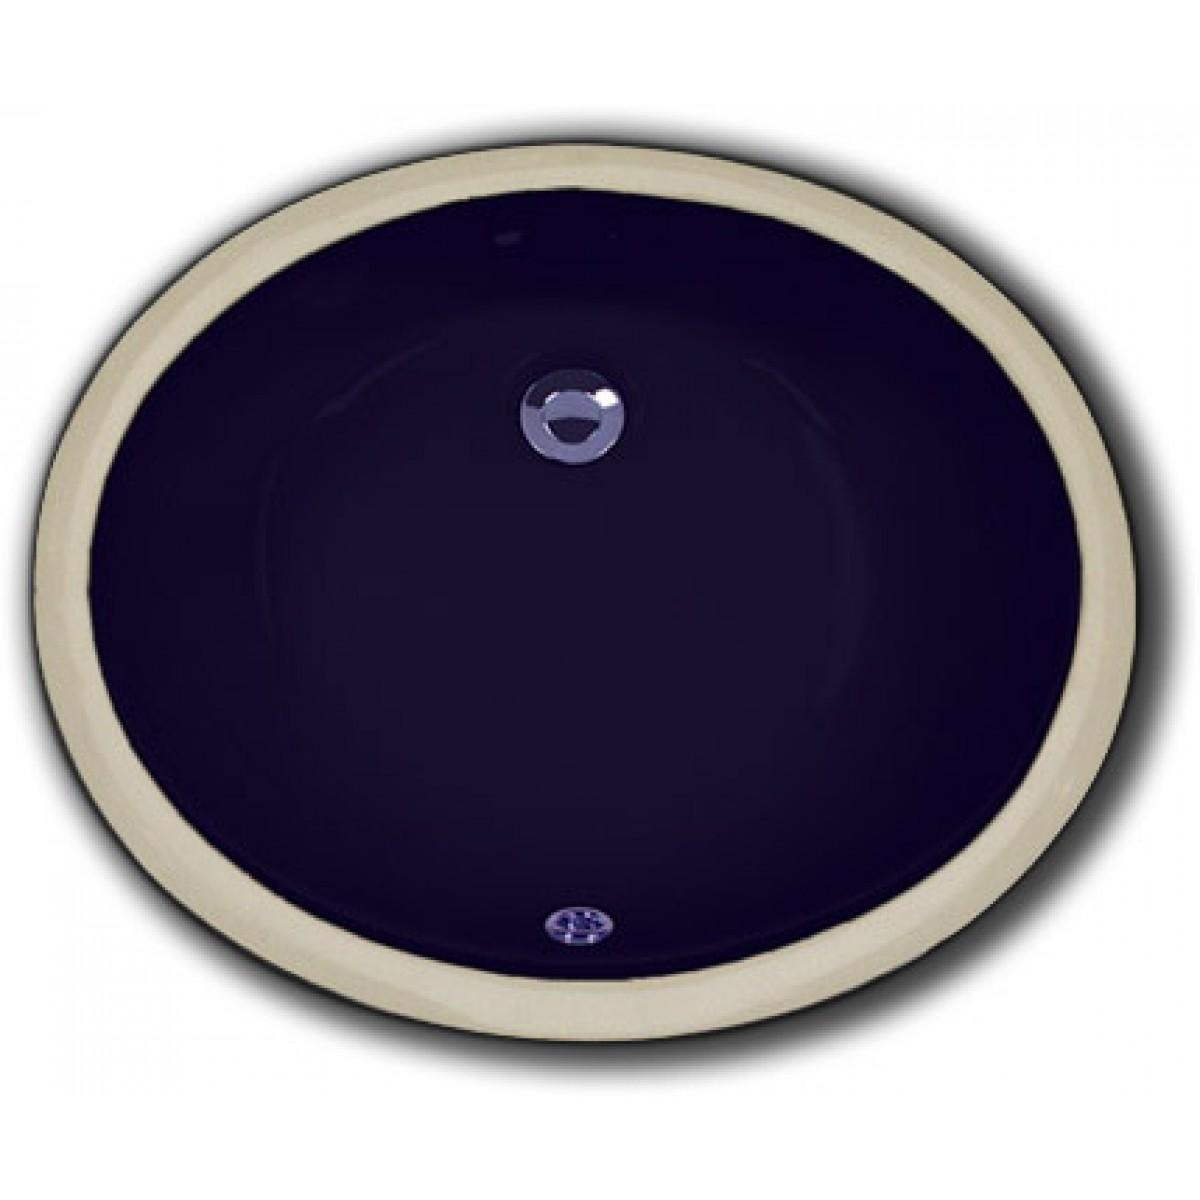 Biscuit Porcelain Ceramic Vanity Undermount Bathroom Vessel Sink   17 X 14  X 6 Inch